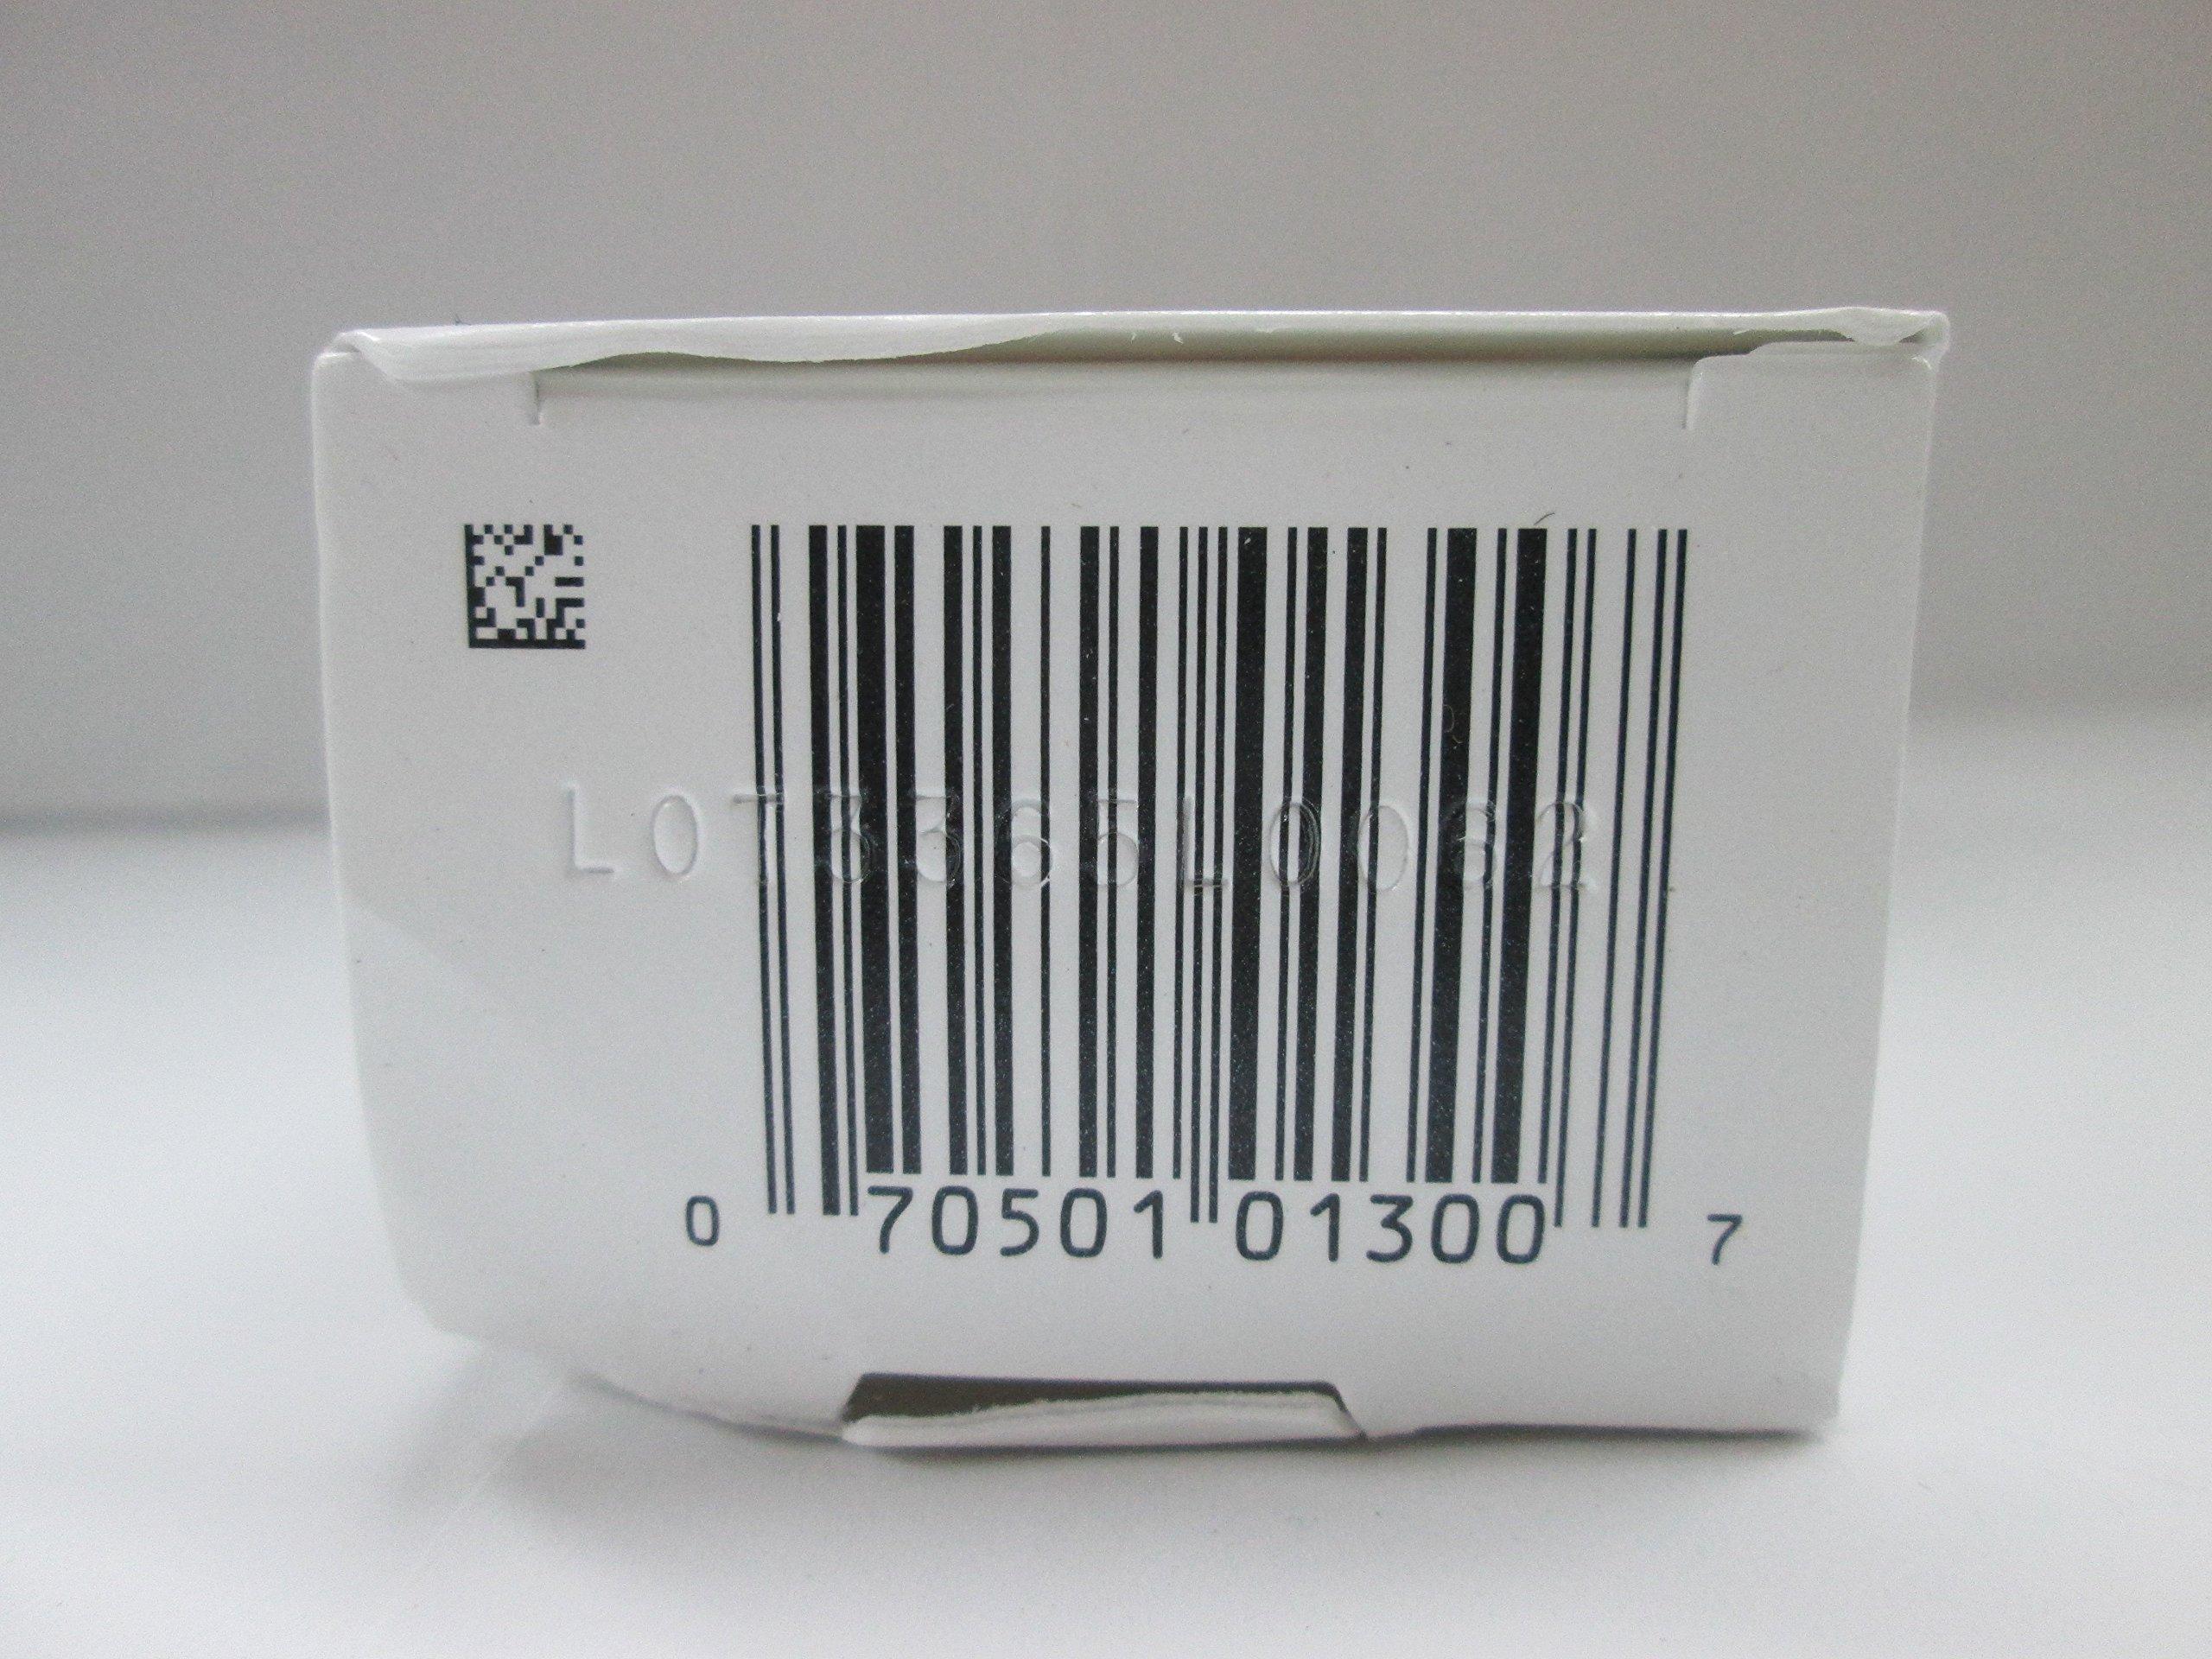 Neutrogena Unscented Norwegian Formula Hand Cream, 2 Ounces each (Value Pack of 6) by Neutrogena